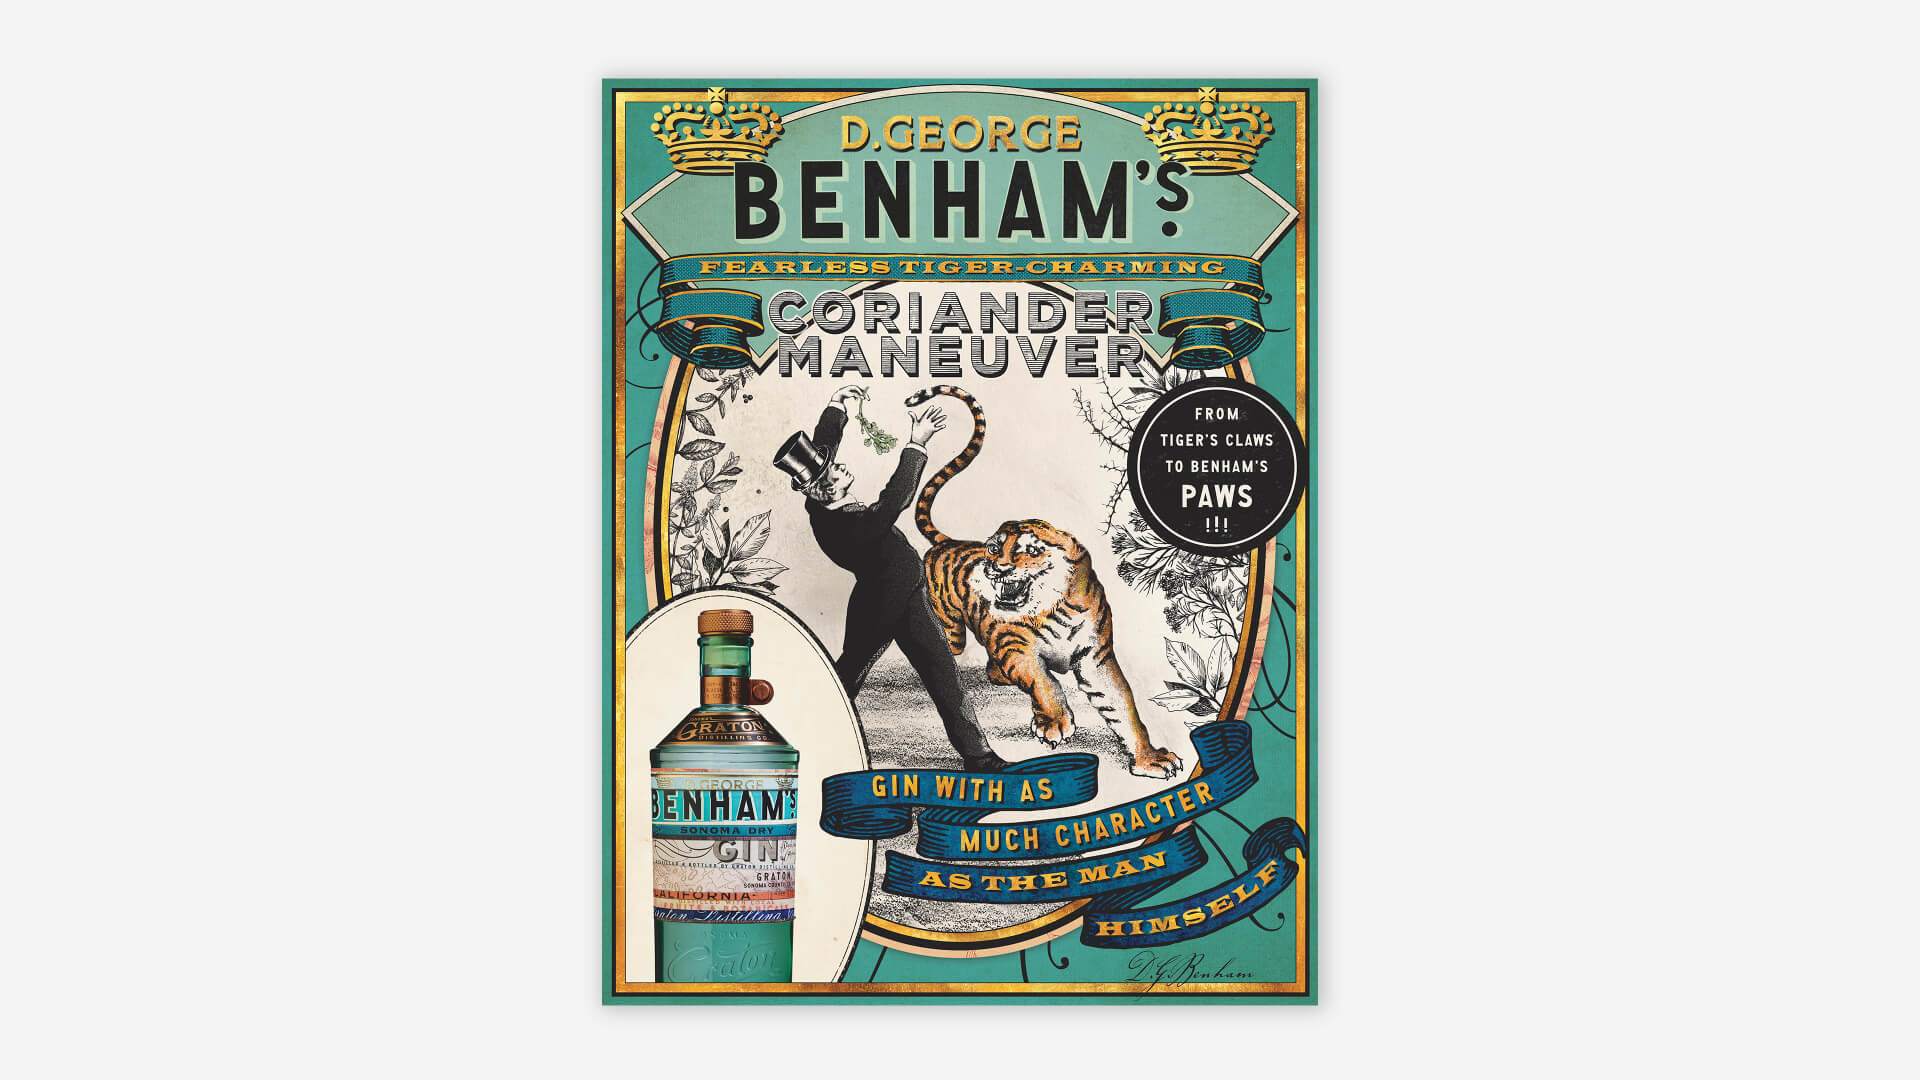 Benham's Leave-Behind